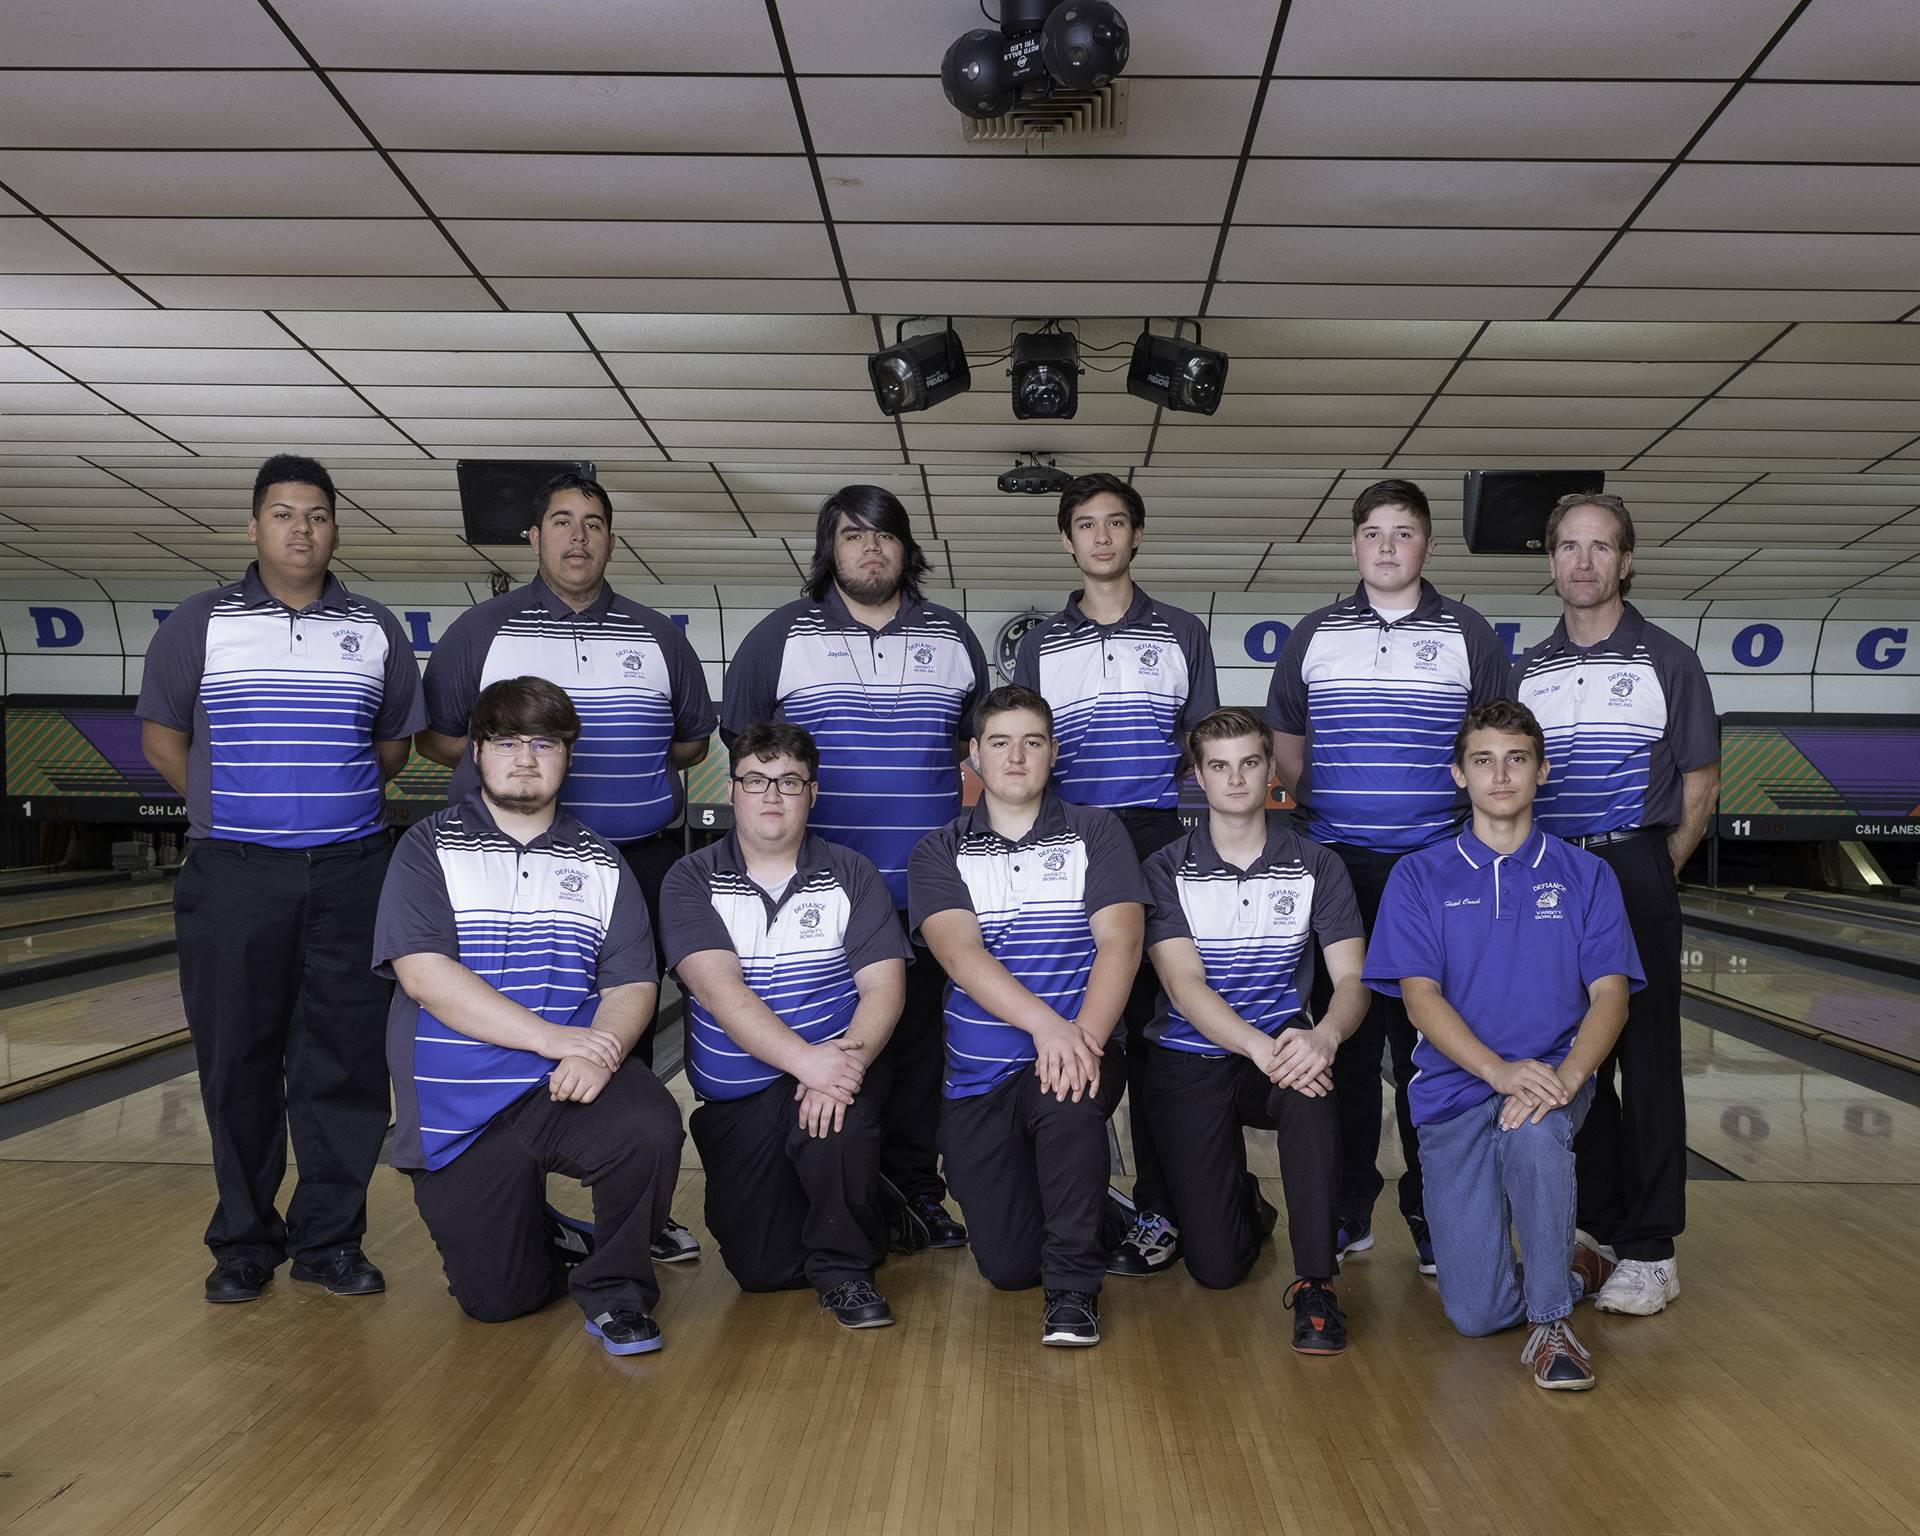 Boys Team Pic